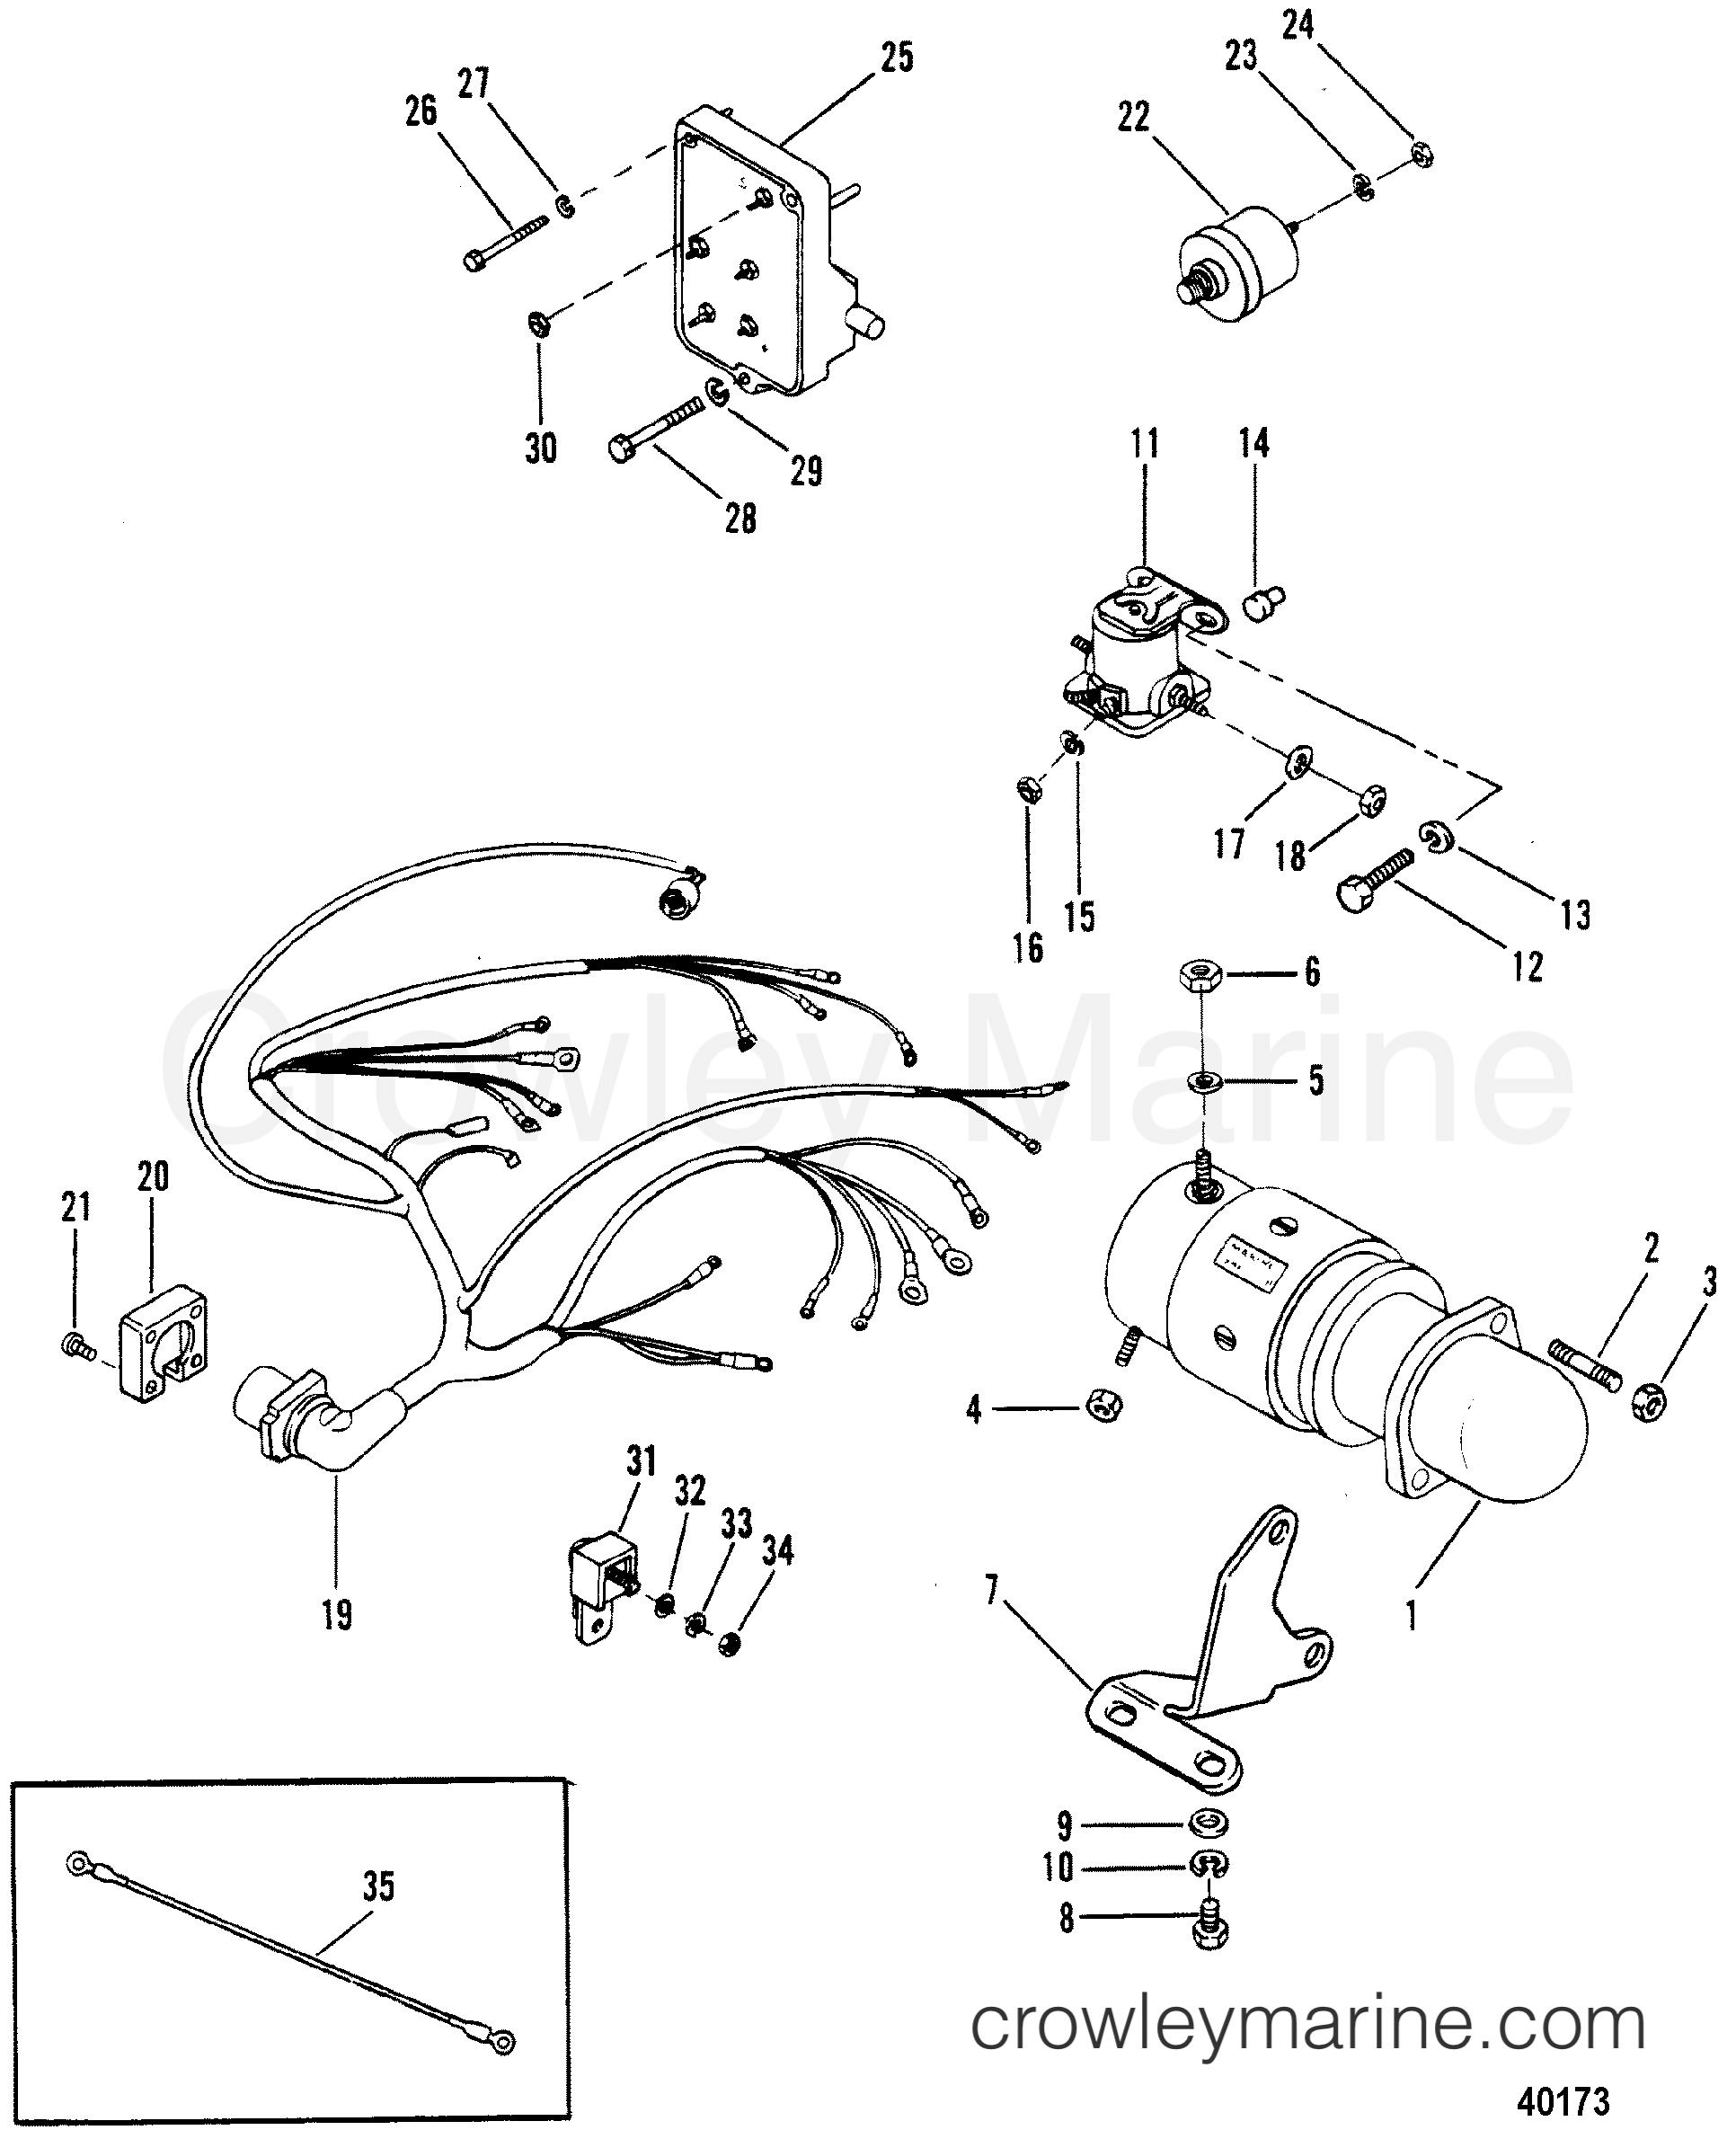 1983 mercury outboard wiring diagram starter motor and wiring harness 1983 mercruiser 470 04707333  starter motor and wiring harness 1983